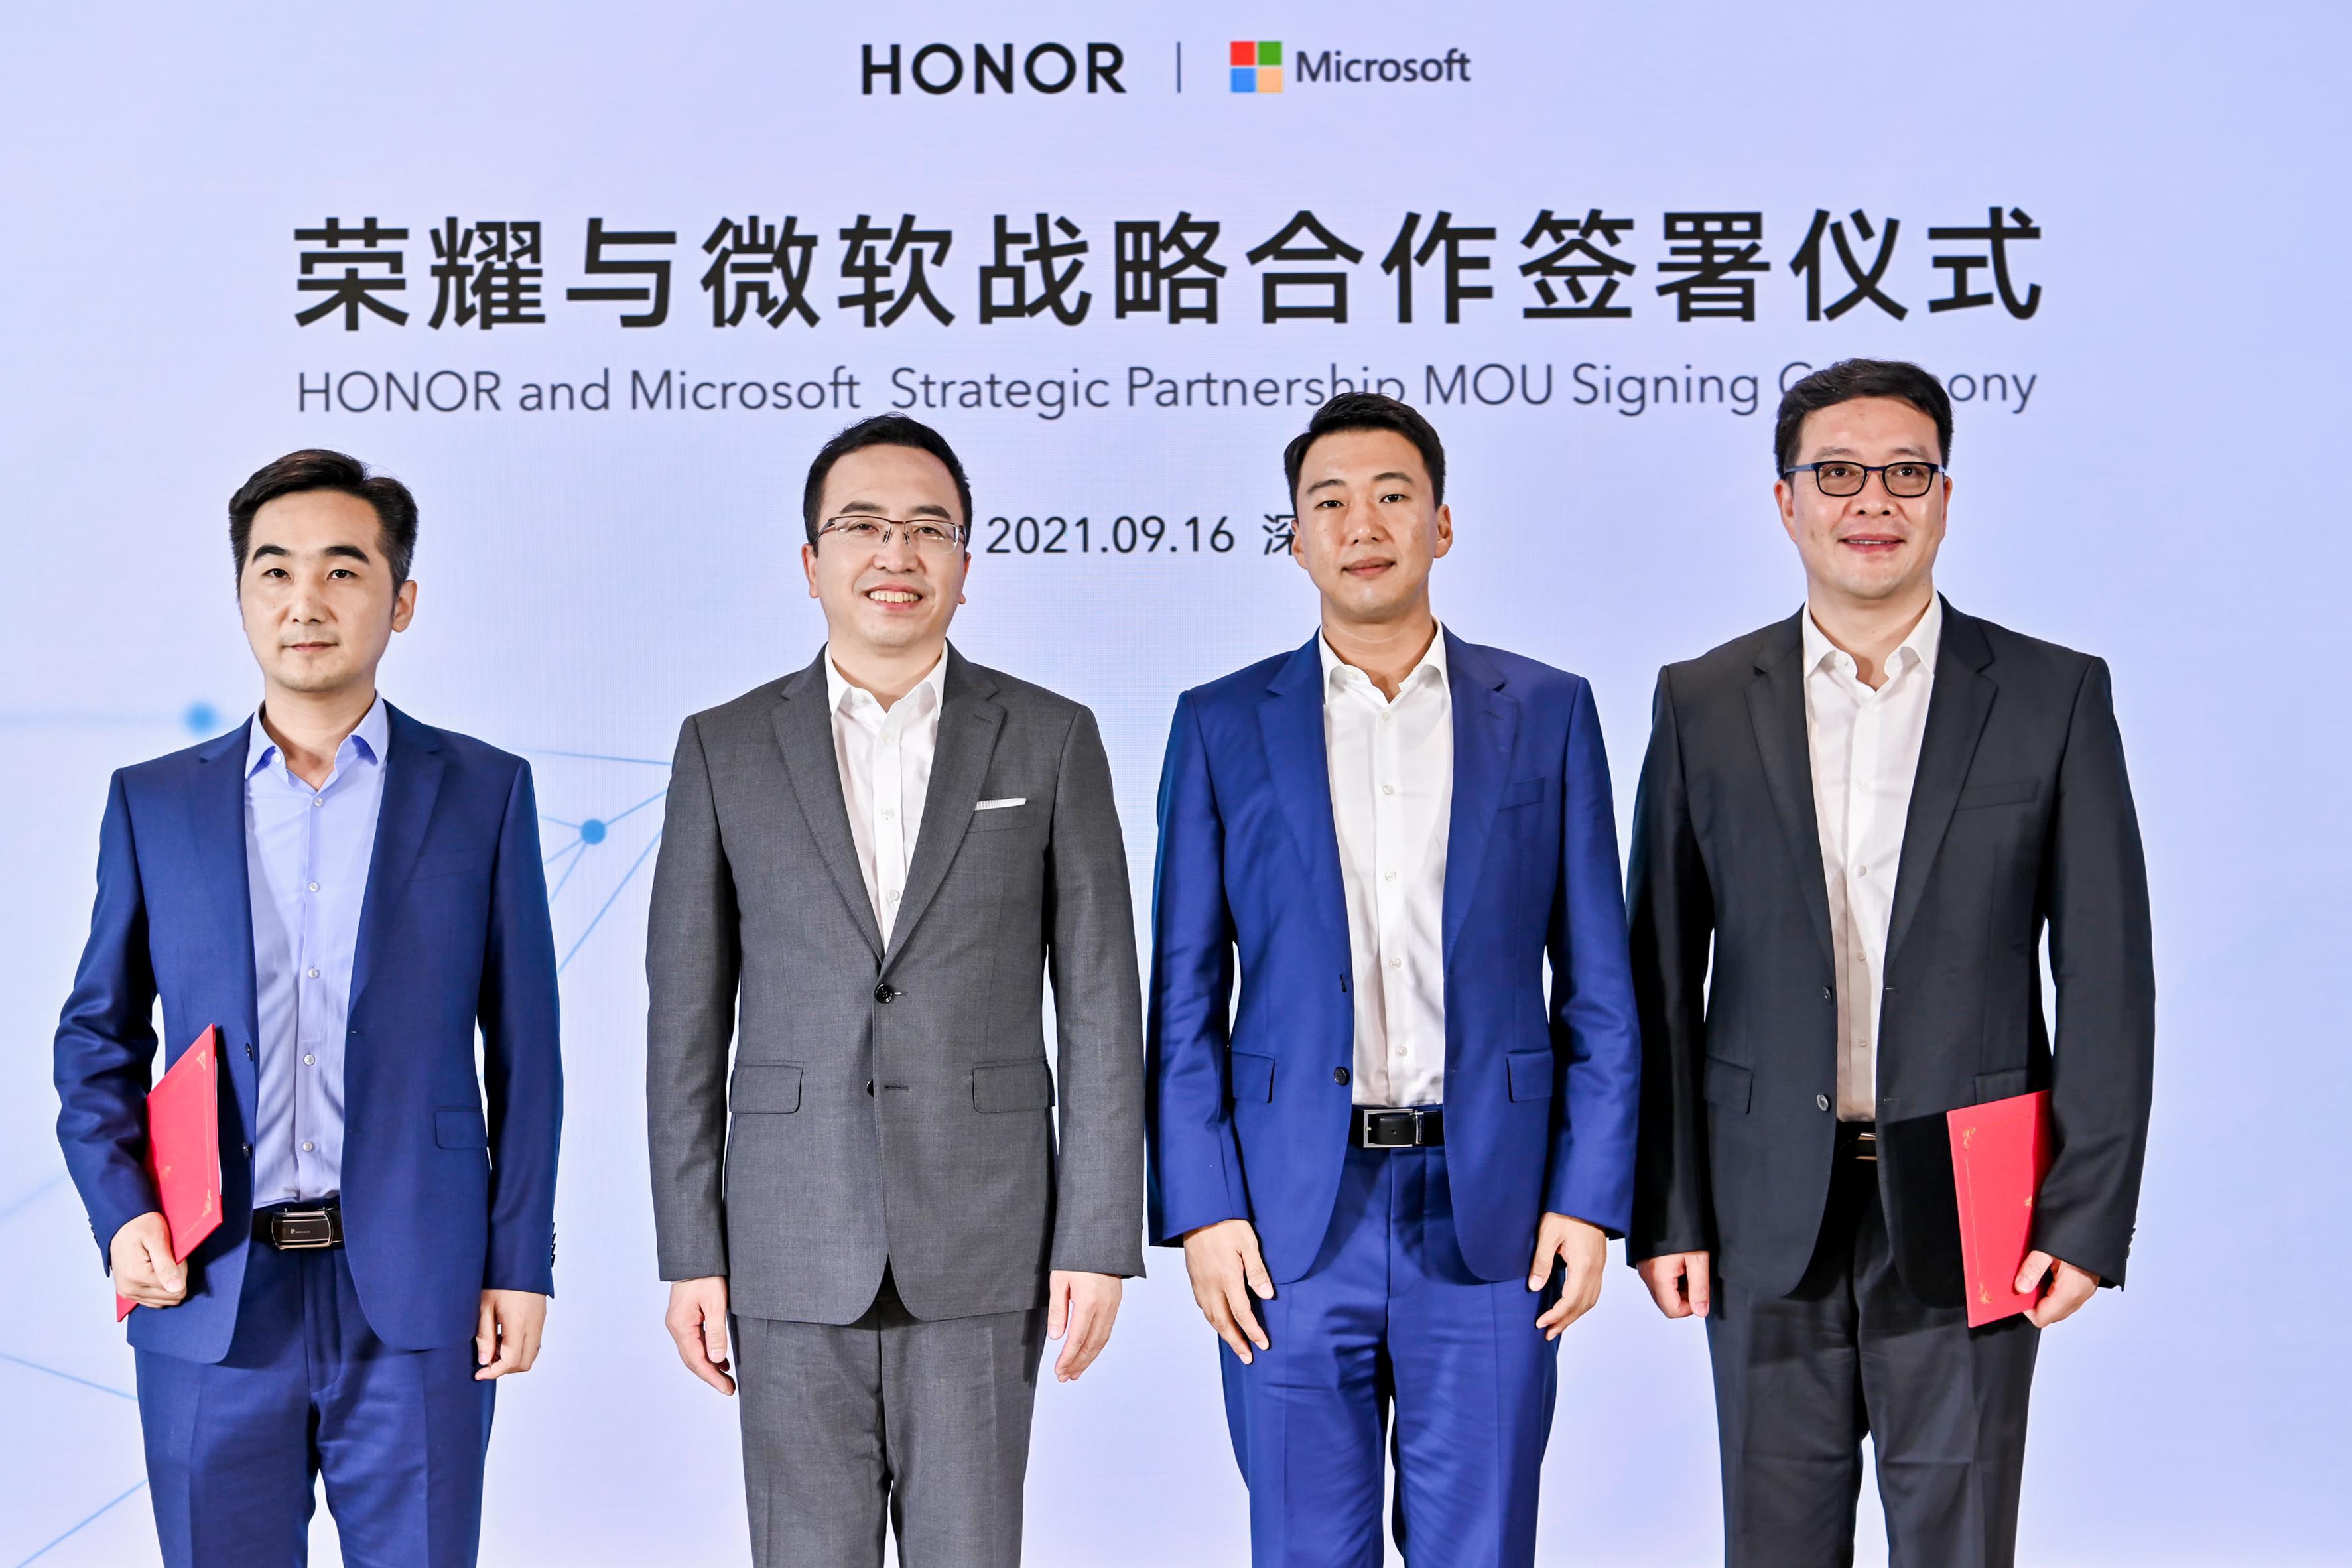 HONOR - HONOR and Microsoft Strategic Partnership MOU Signing Ceremony